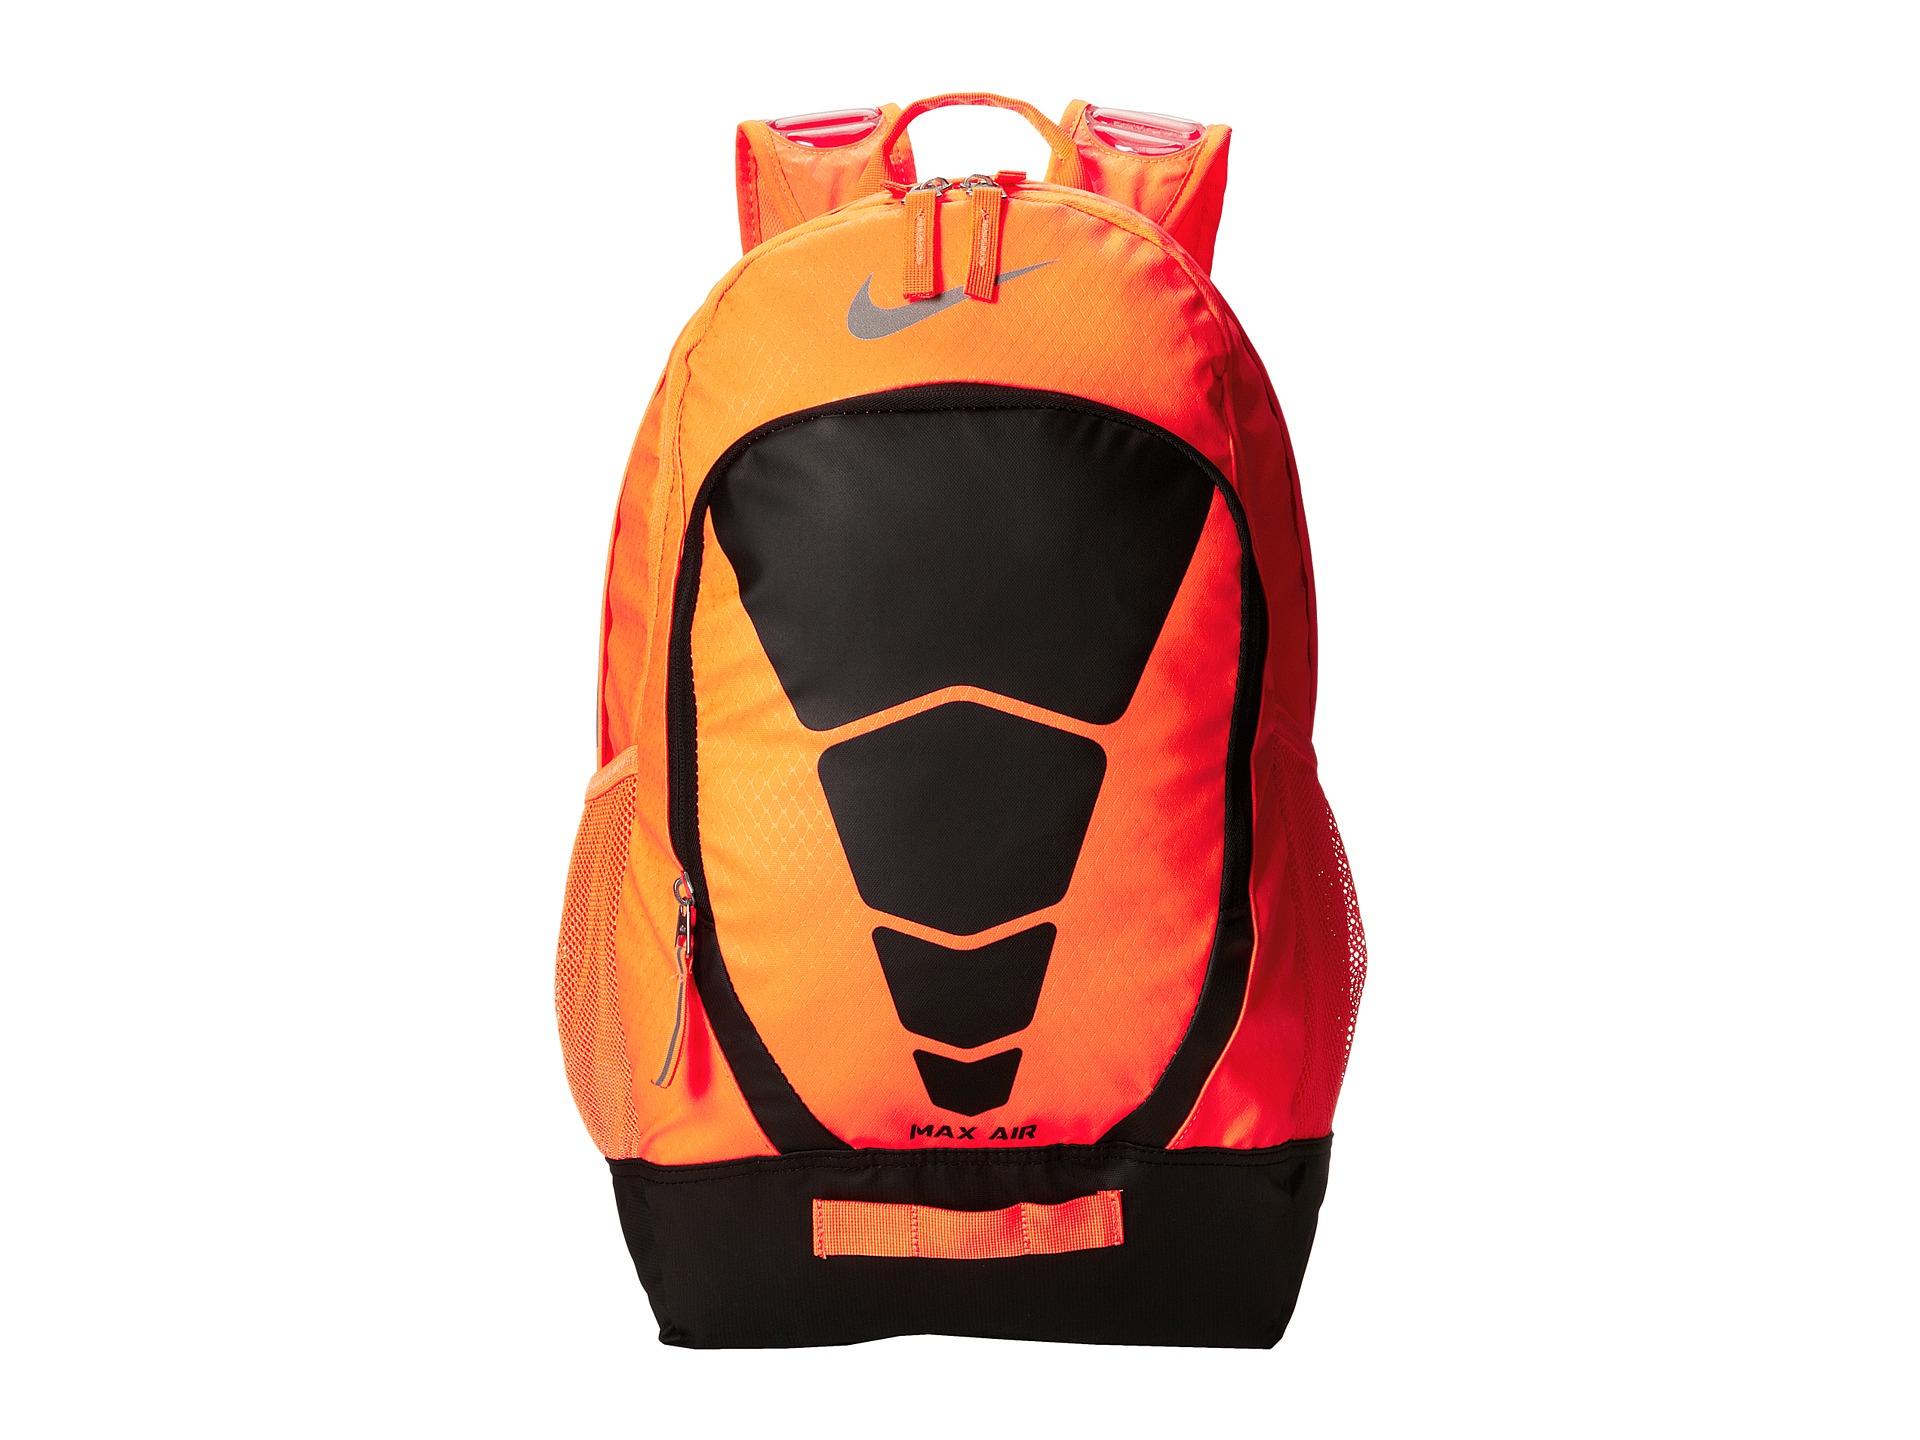 d98d0c4aa2 Lyst - Nike Max Air Vapor Backpack in Orange